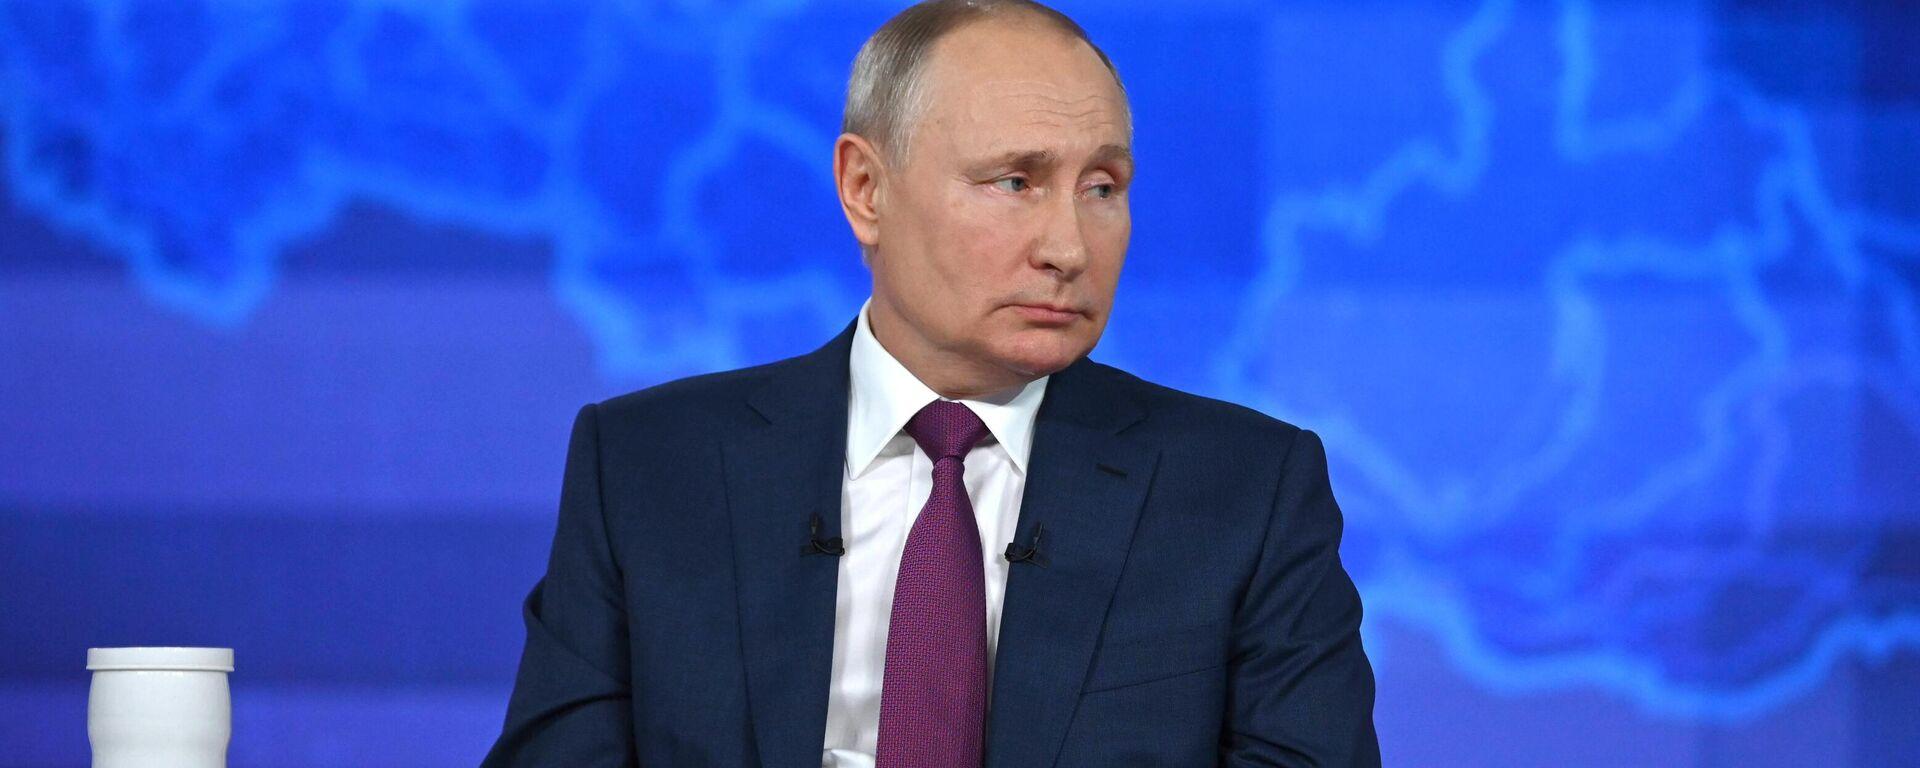 Línea directa con Vladímir Putin 2021 - Sputnik Mundo, 1920, 30.06.2021